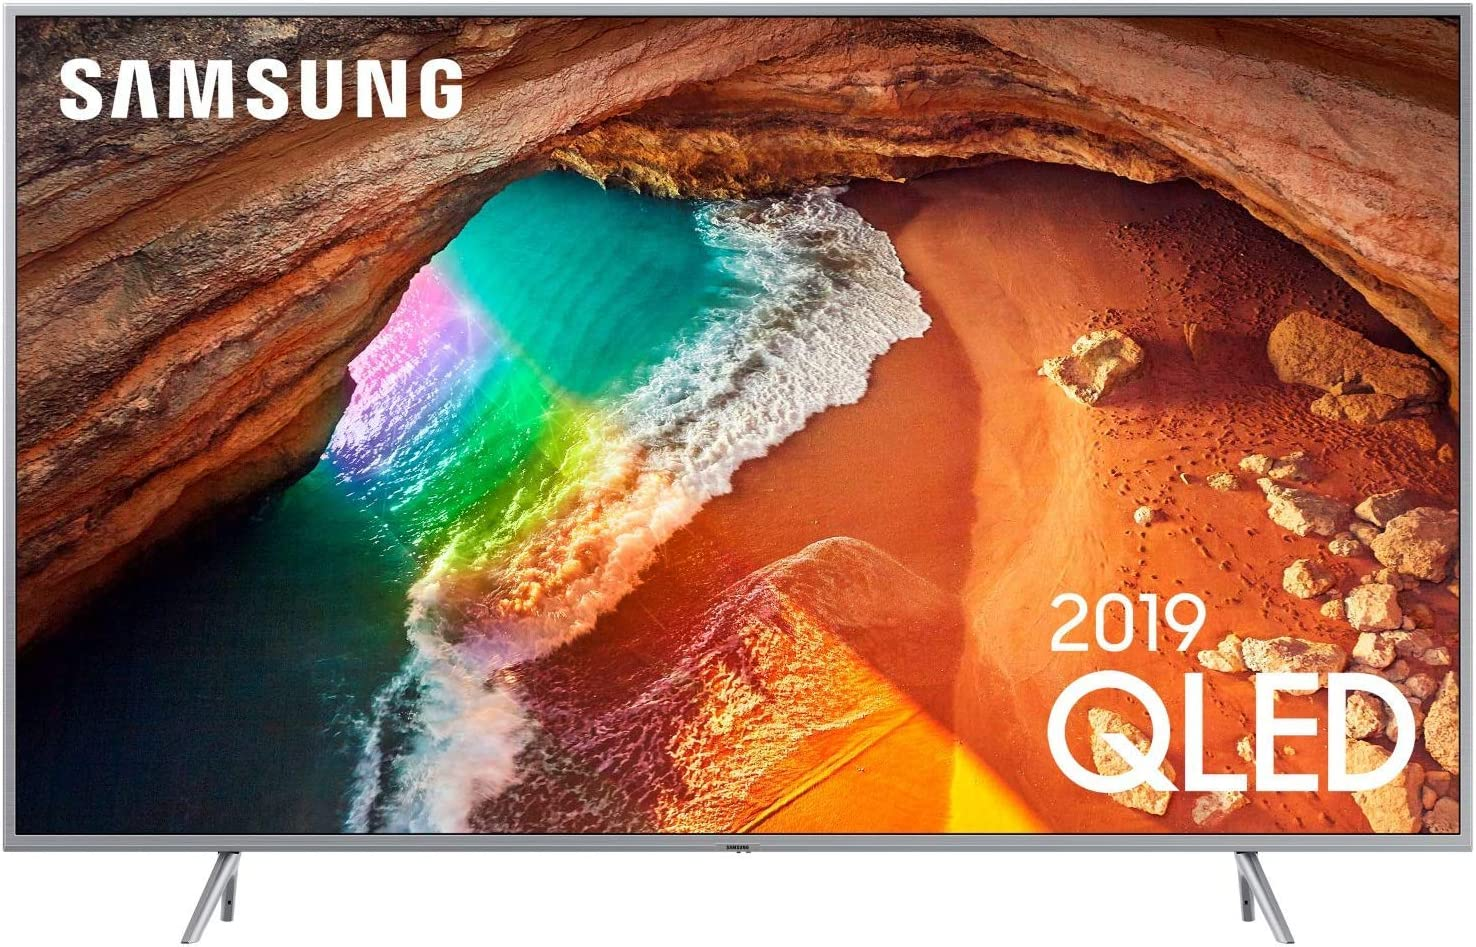 Samsung - Smart TV 4K/UHD QLED 49